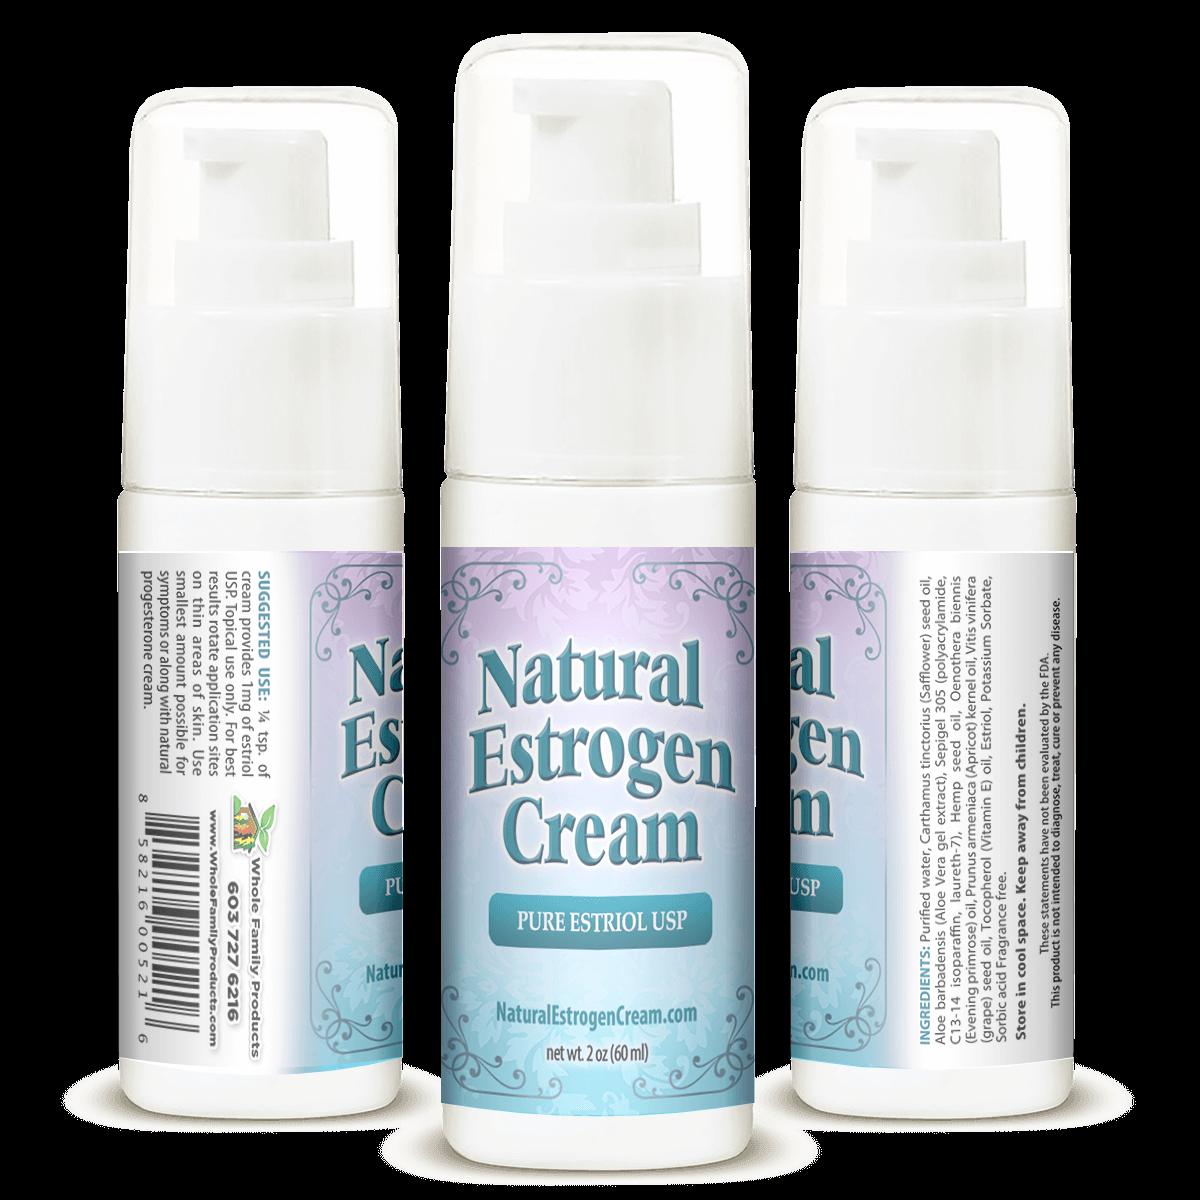 Best Natural Estrogen Cream 2oz Pump Helps Women Increase Libido